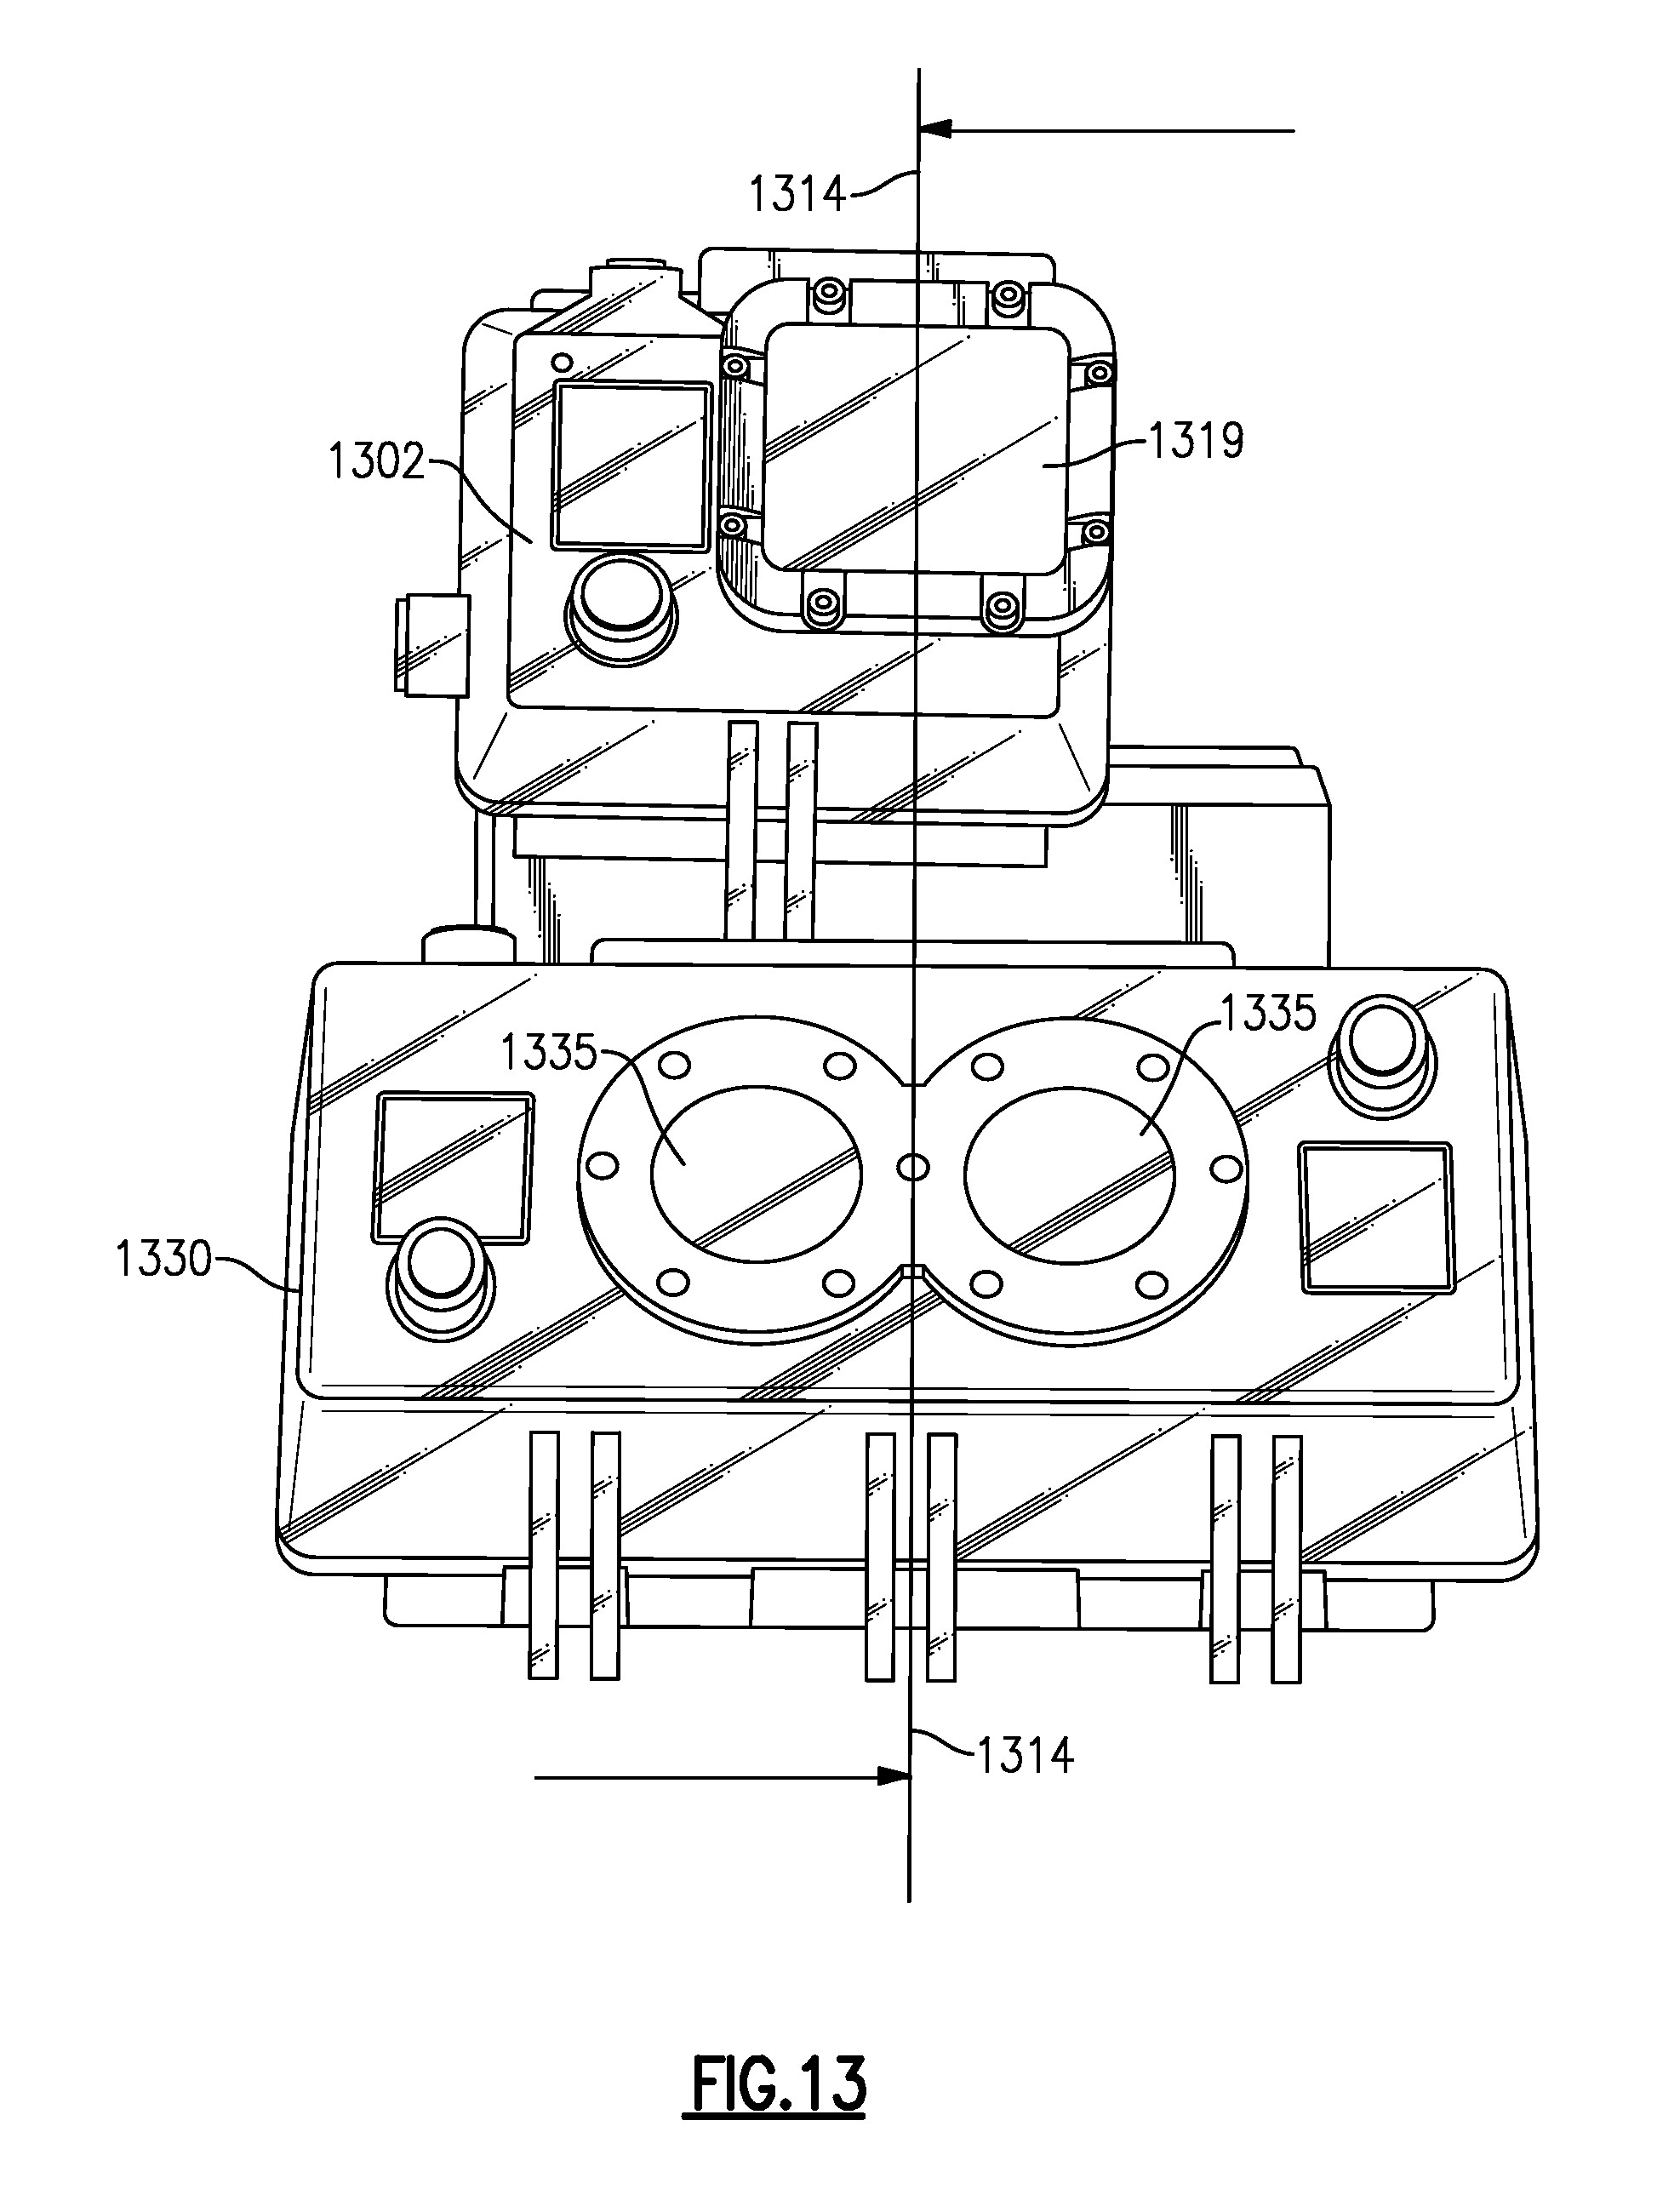 Car Parts Diagram Under Hood Fine Labeled Car Parts S Electrical System Block Diagram Of Car Parts Diagram Under Hood